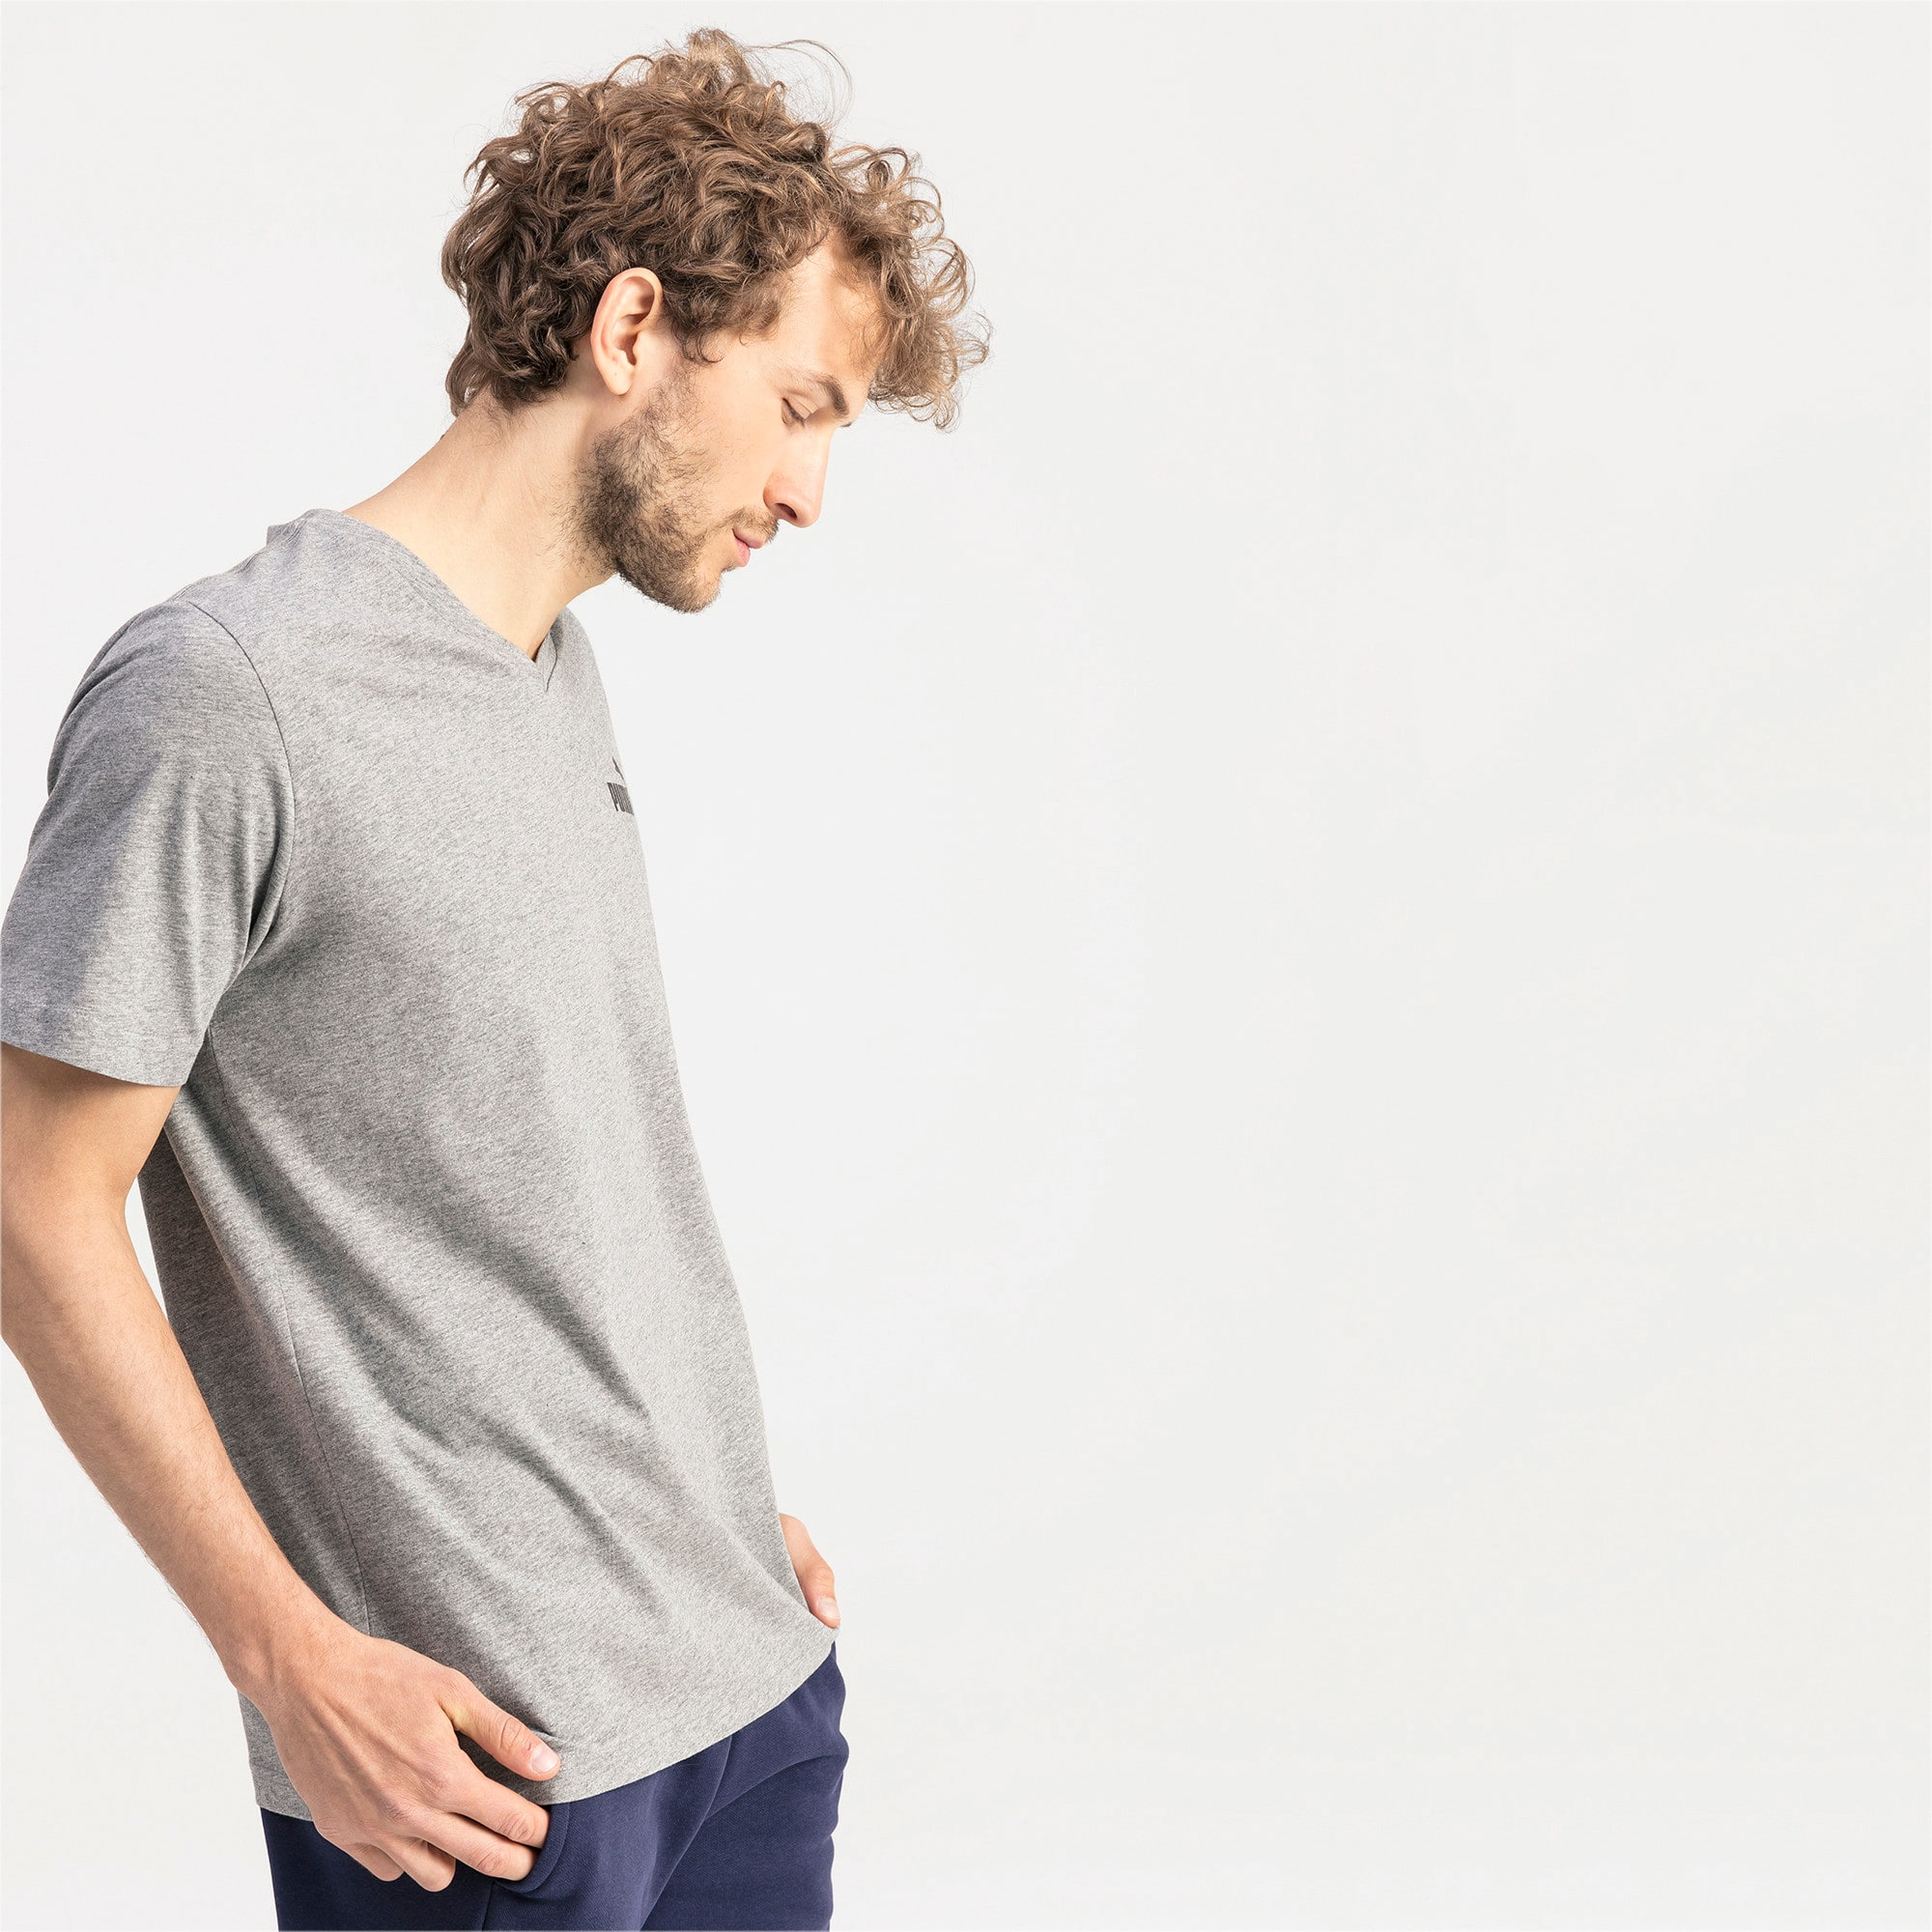 Thumbnail 1 of T-shirt con scollo a V Essentials uomo, Medium Gray Heather, medium